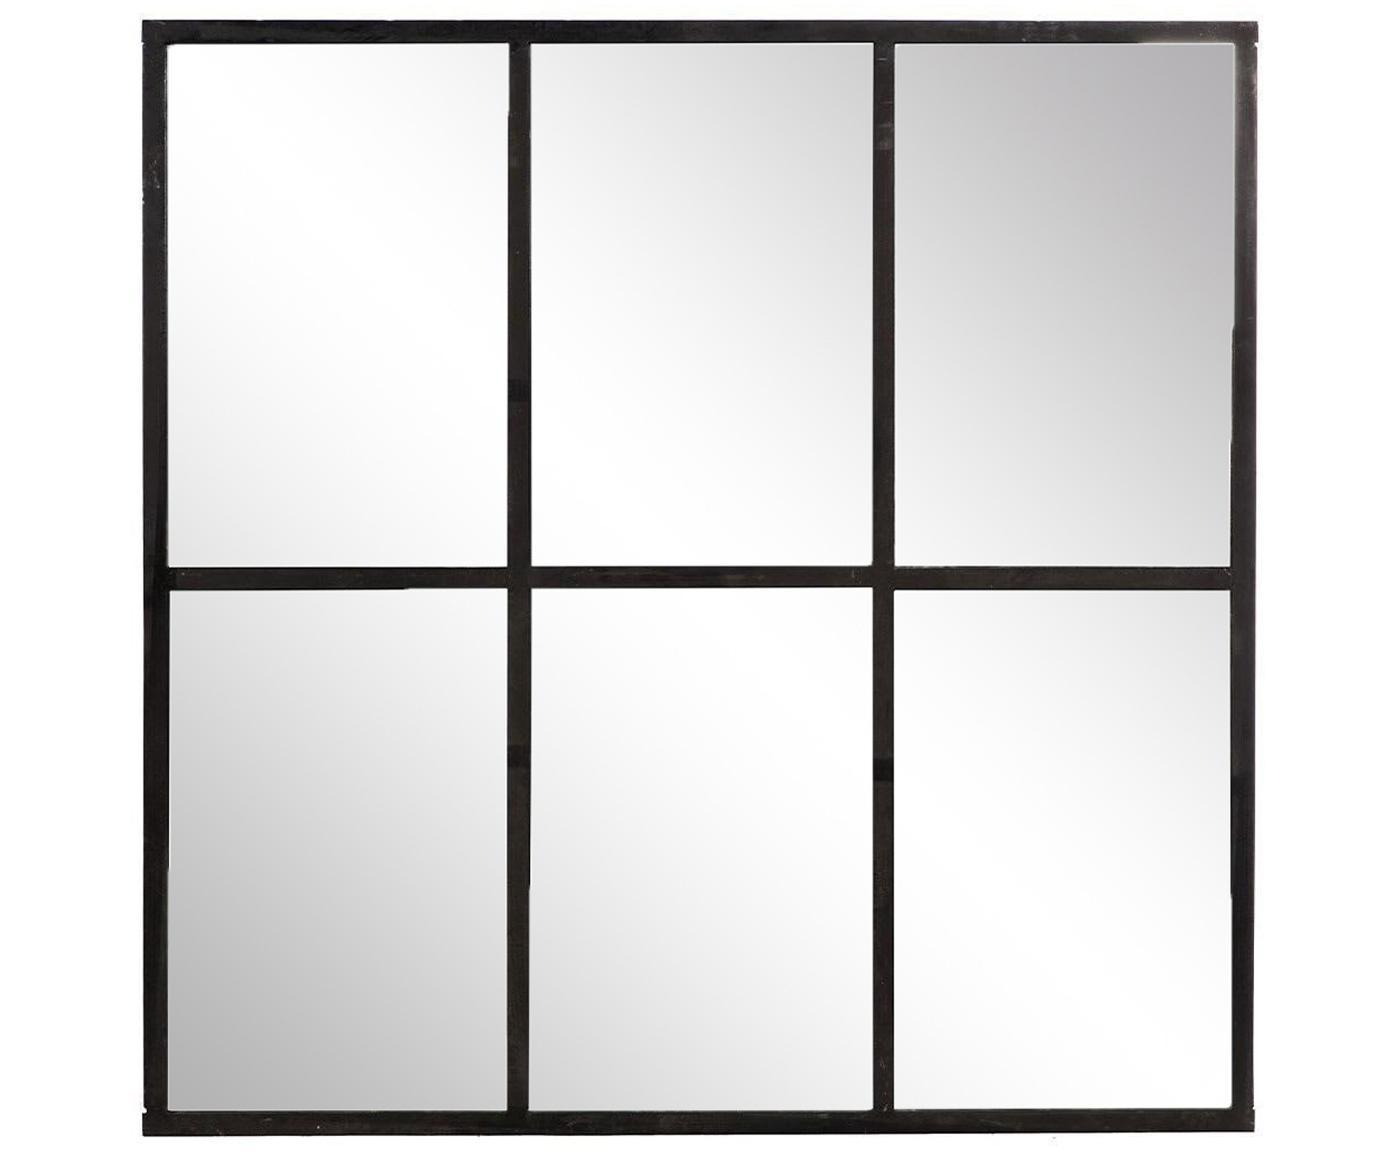 Espejo de pared Industrial, Estructura: hierro, Espejo: cristal, Negro, An 93 x Al 93 cm